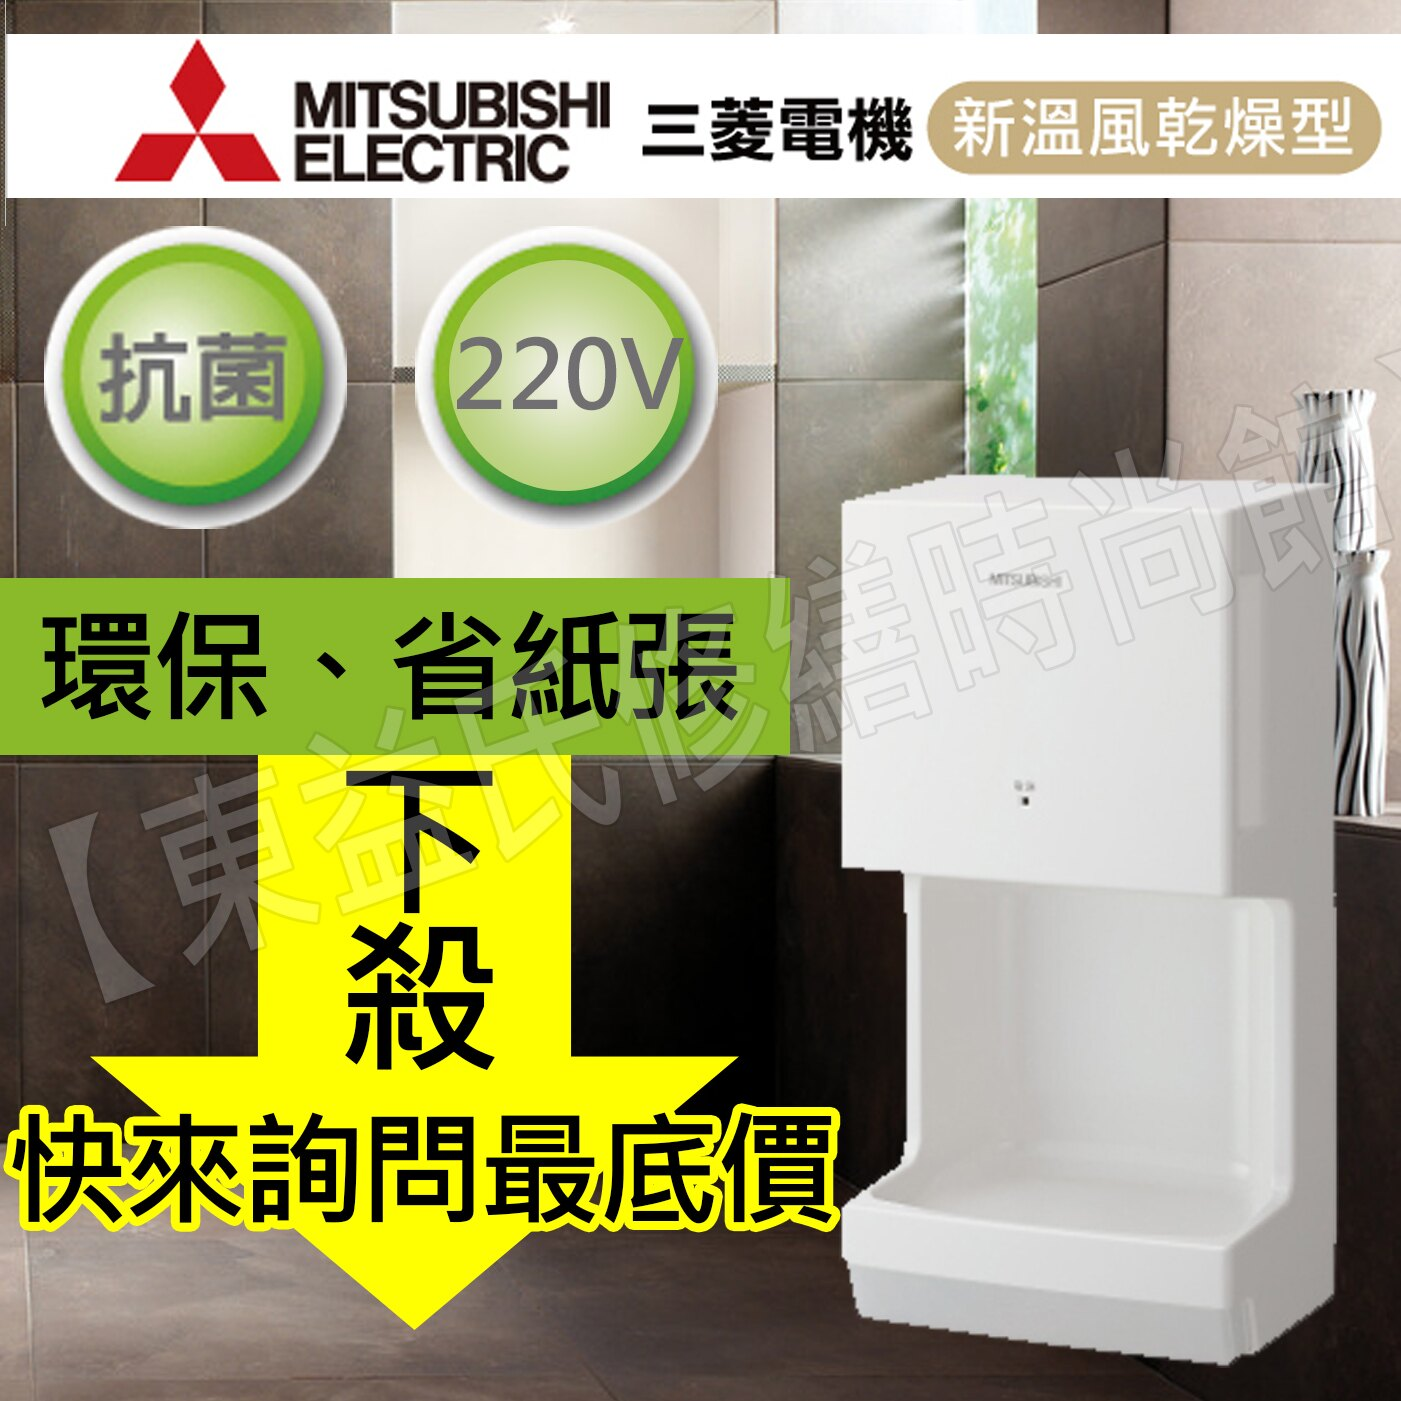 JT-MC206GS 迷你型噴射式乾手機 三菱 節省紙張 另售110V【東益氏】另售 衛浴配件 飲水機